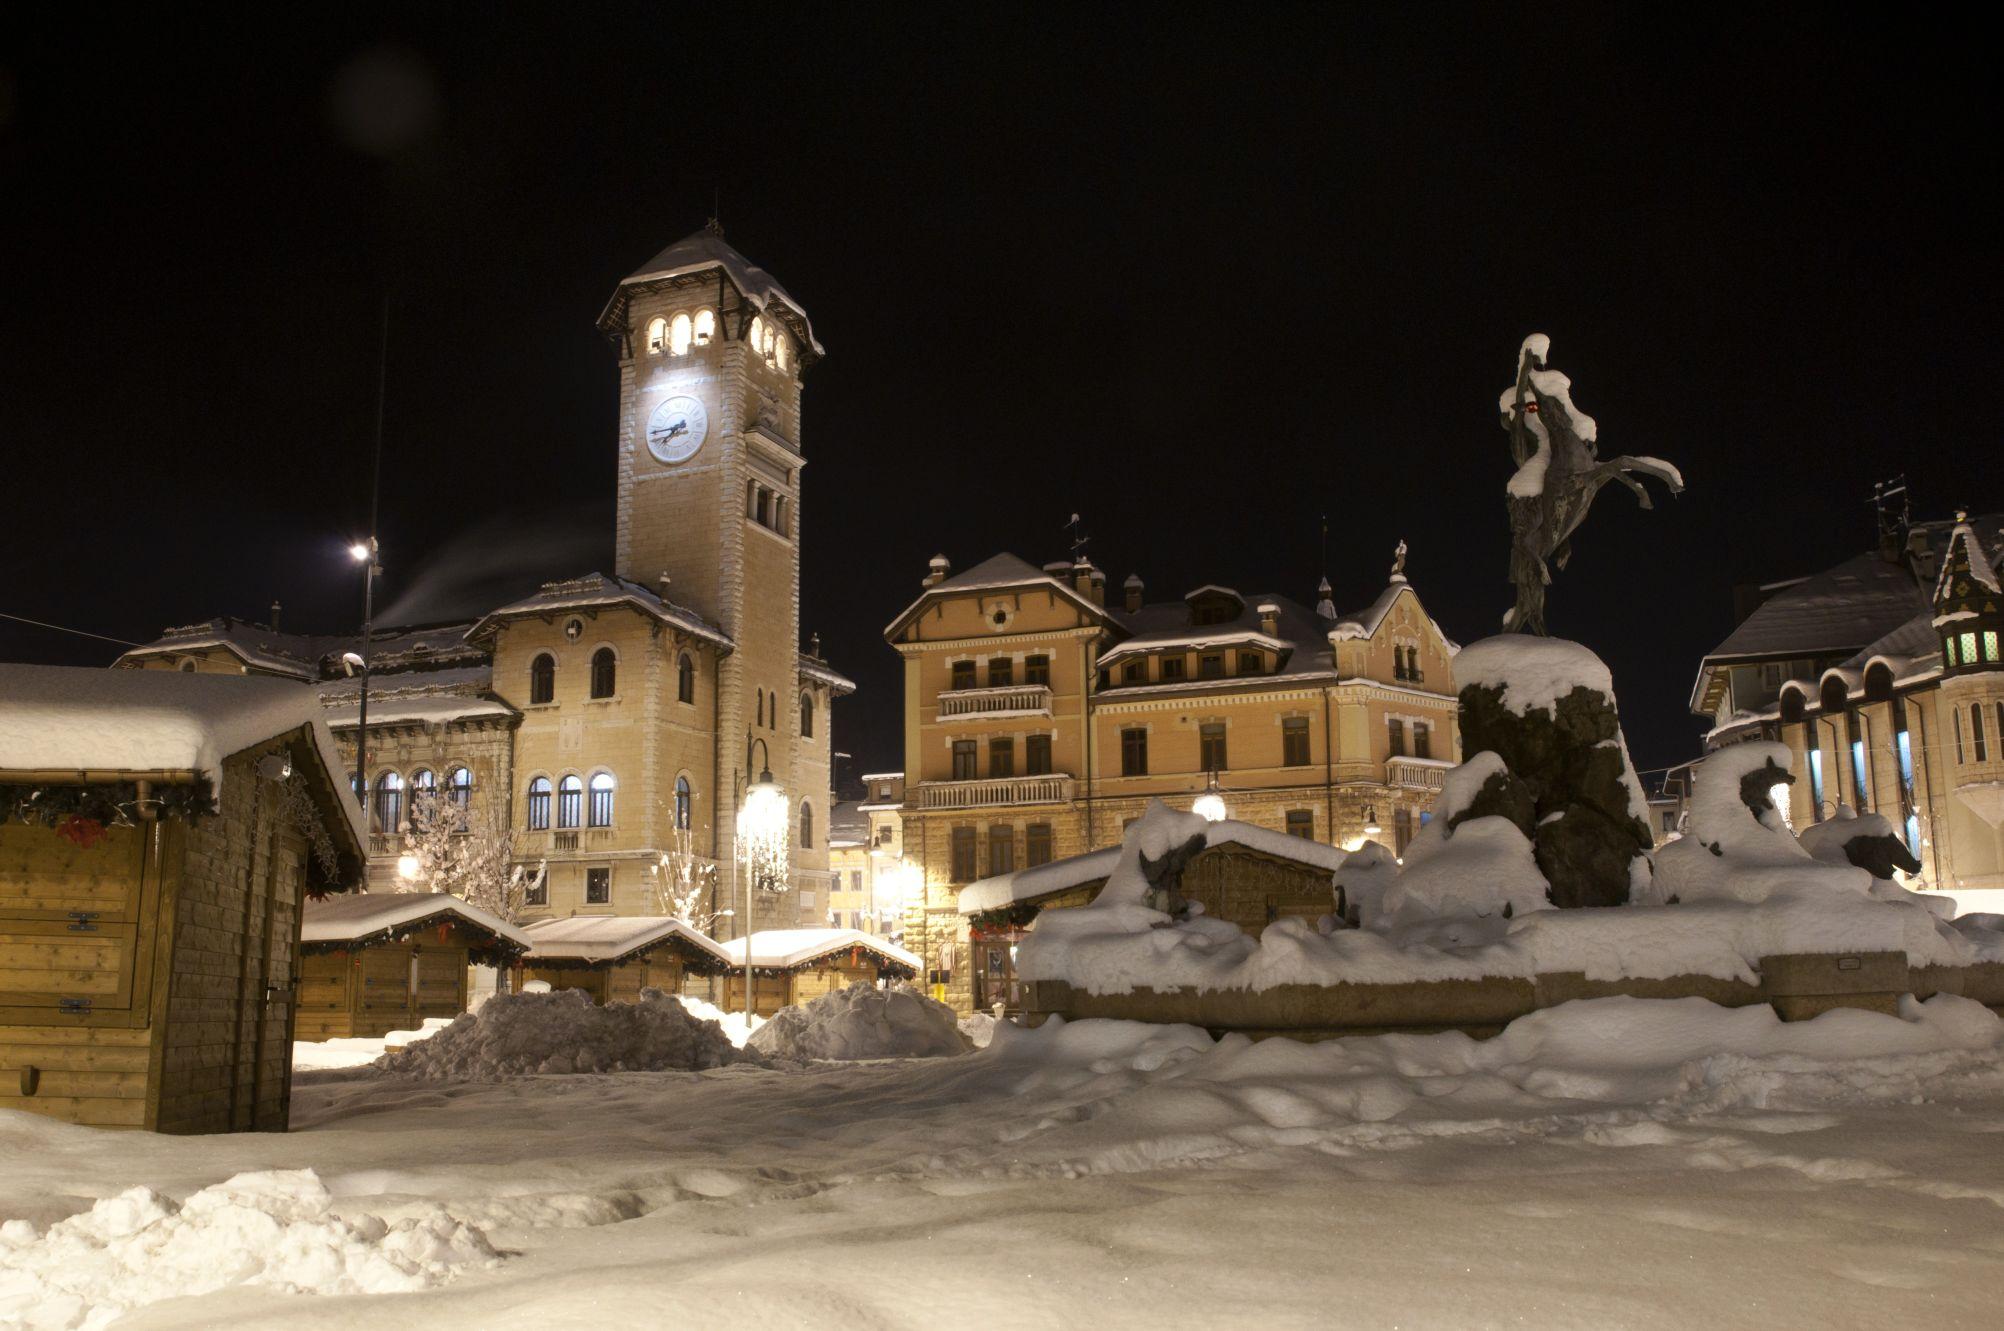 Offerte capodanno sulla neve 2015 asiagoneve for Albergo paradiso asiago